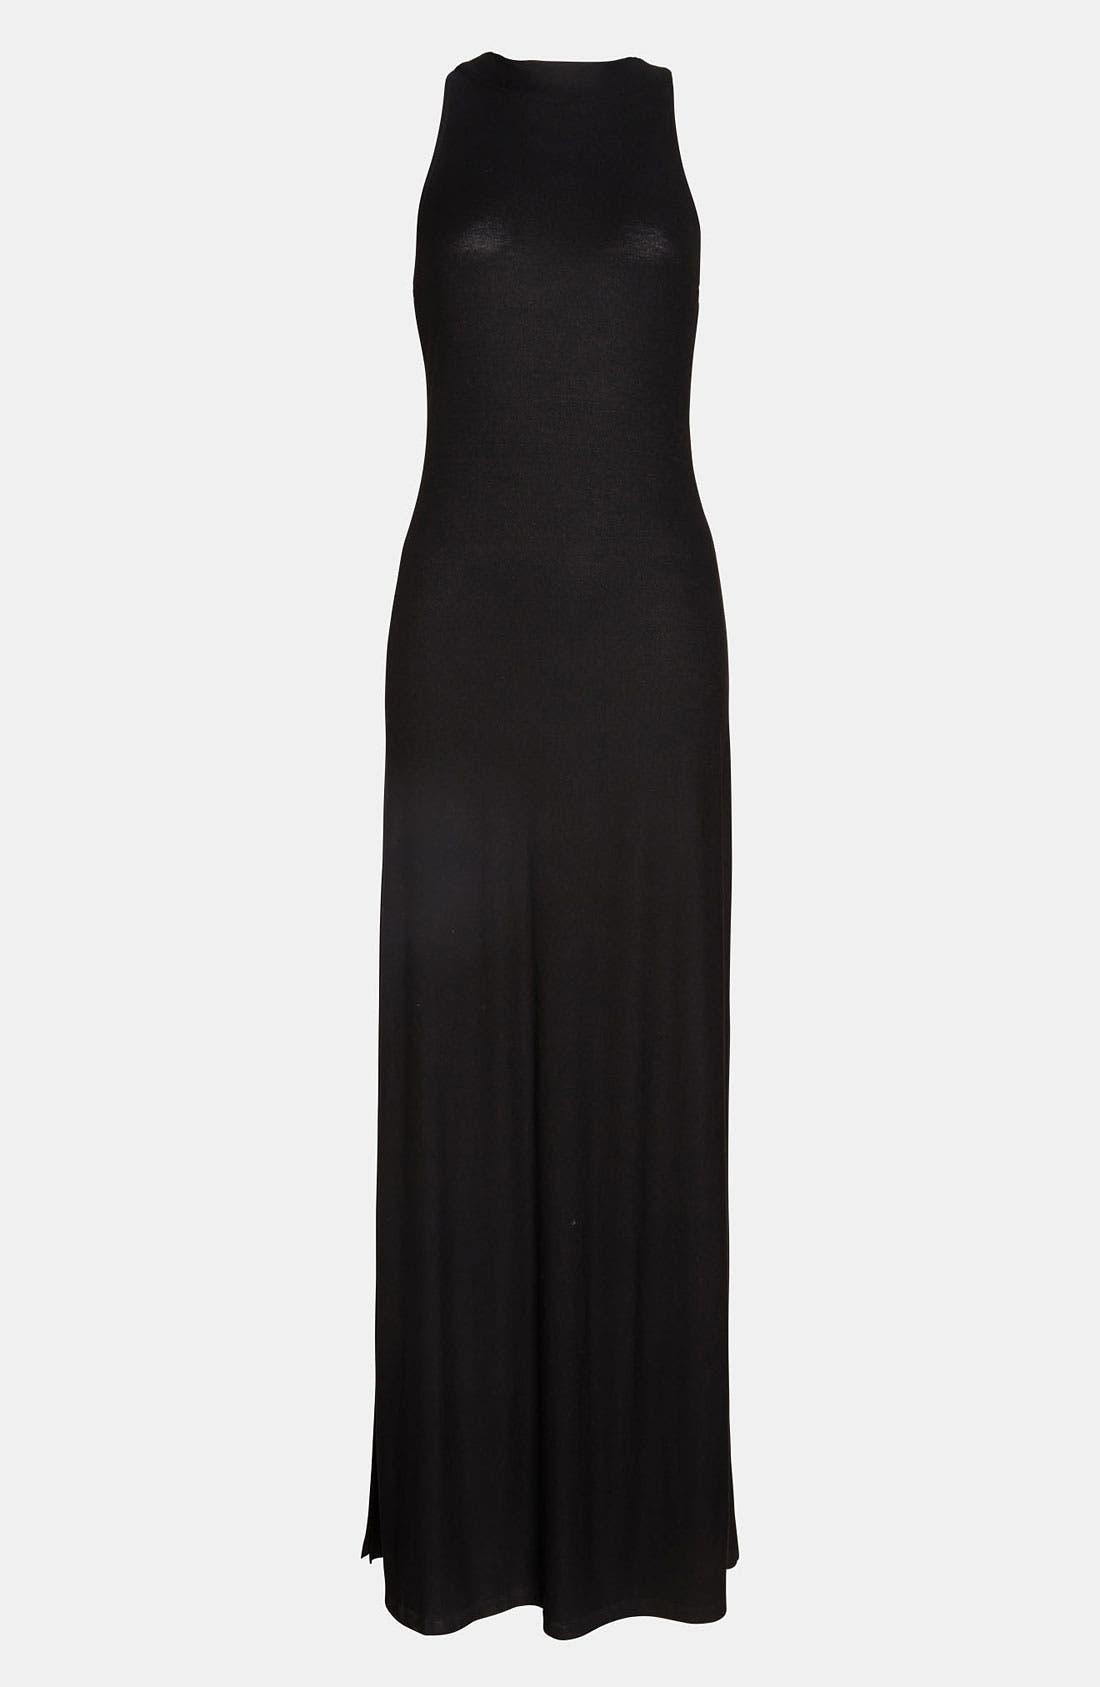 Main Image - ASTR Cutout Back Maxi Dress